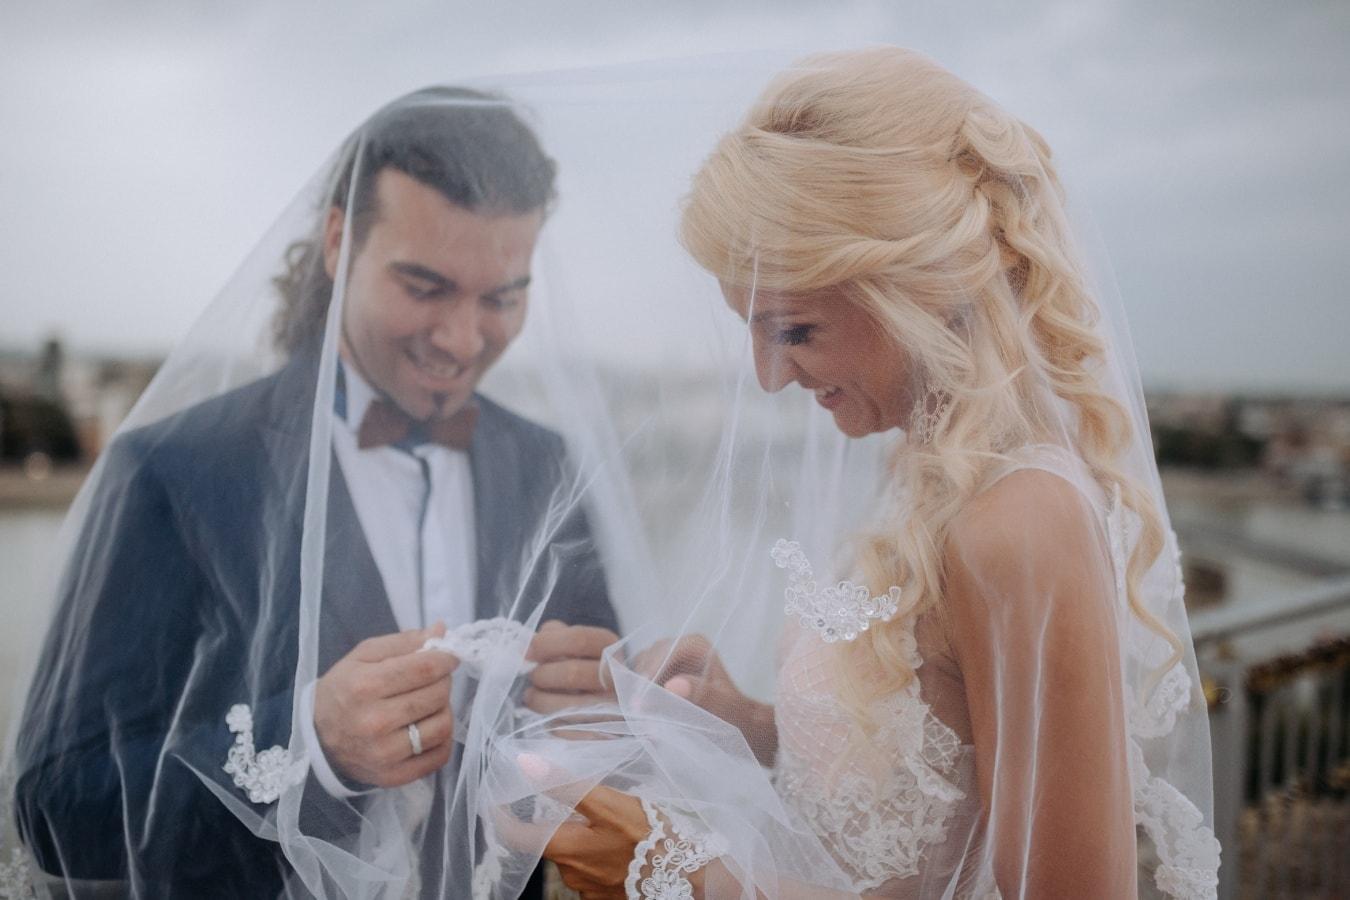 groom, newlyweds, bride, underneath, wedding dress, marriage, engagement, love, woman, romance